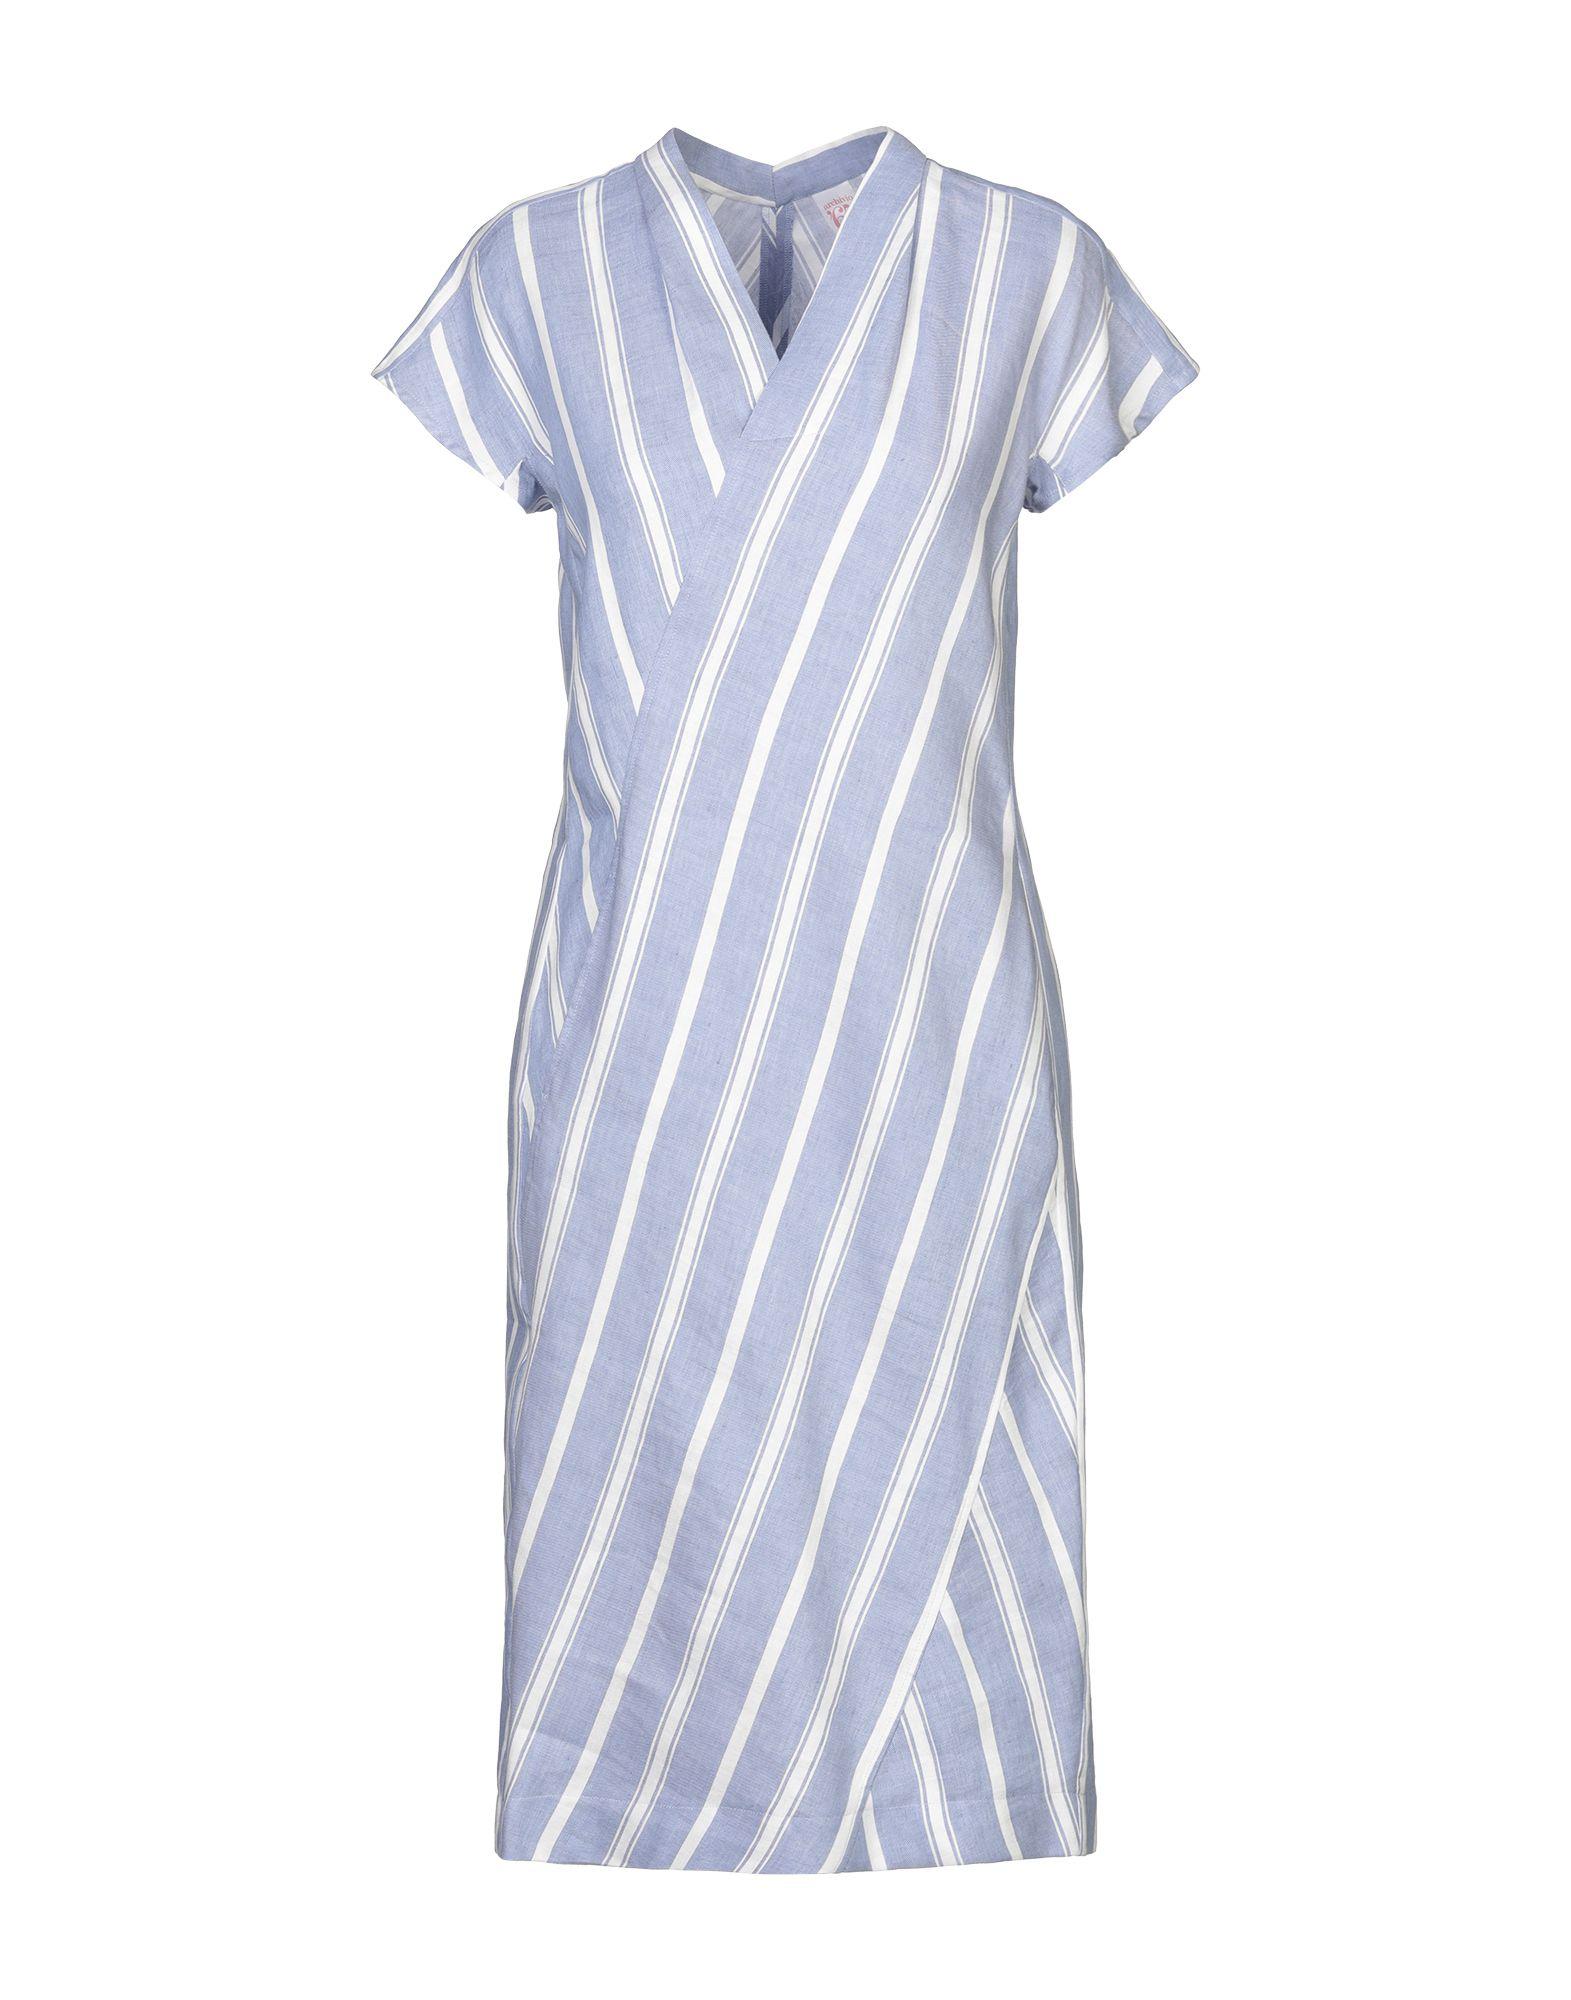 ARCHIVIO '67 Платье до колена